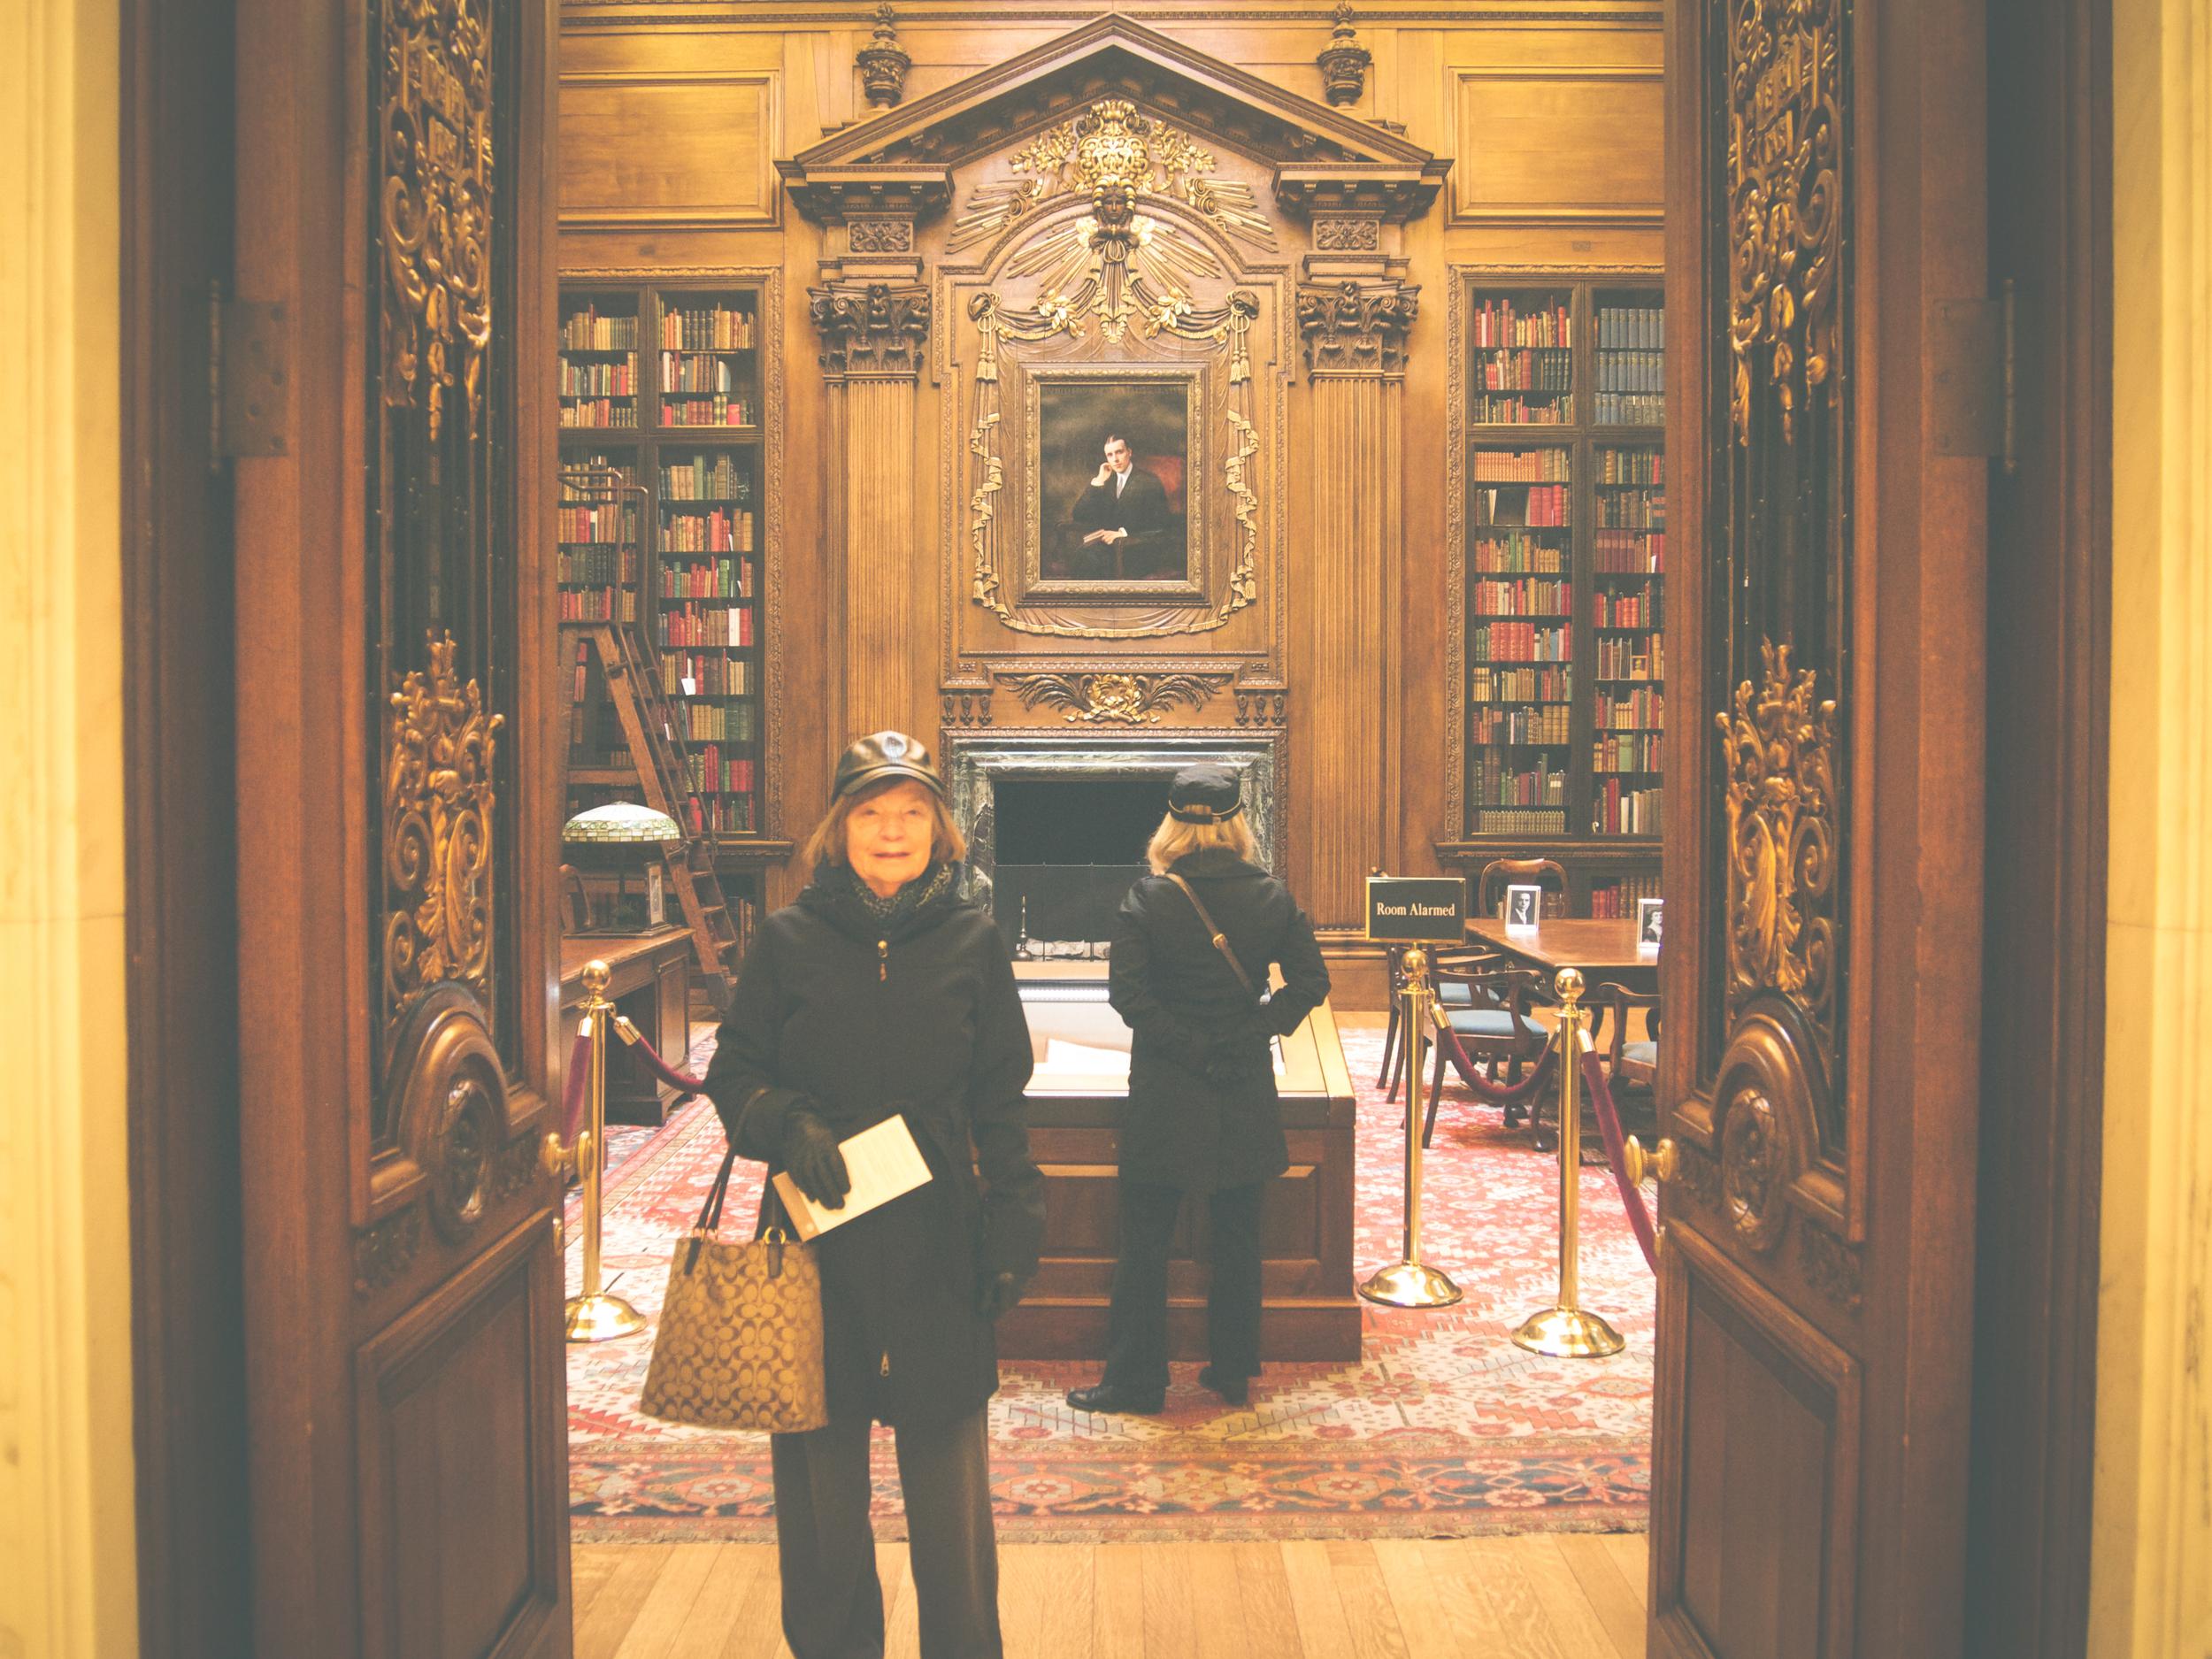 Widener Library